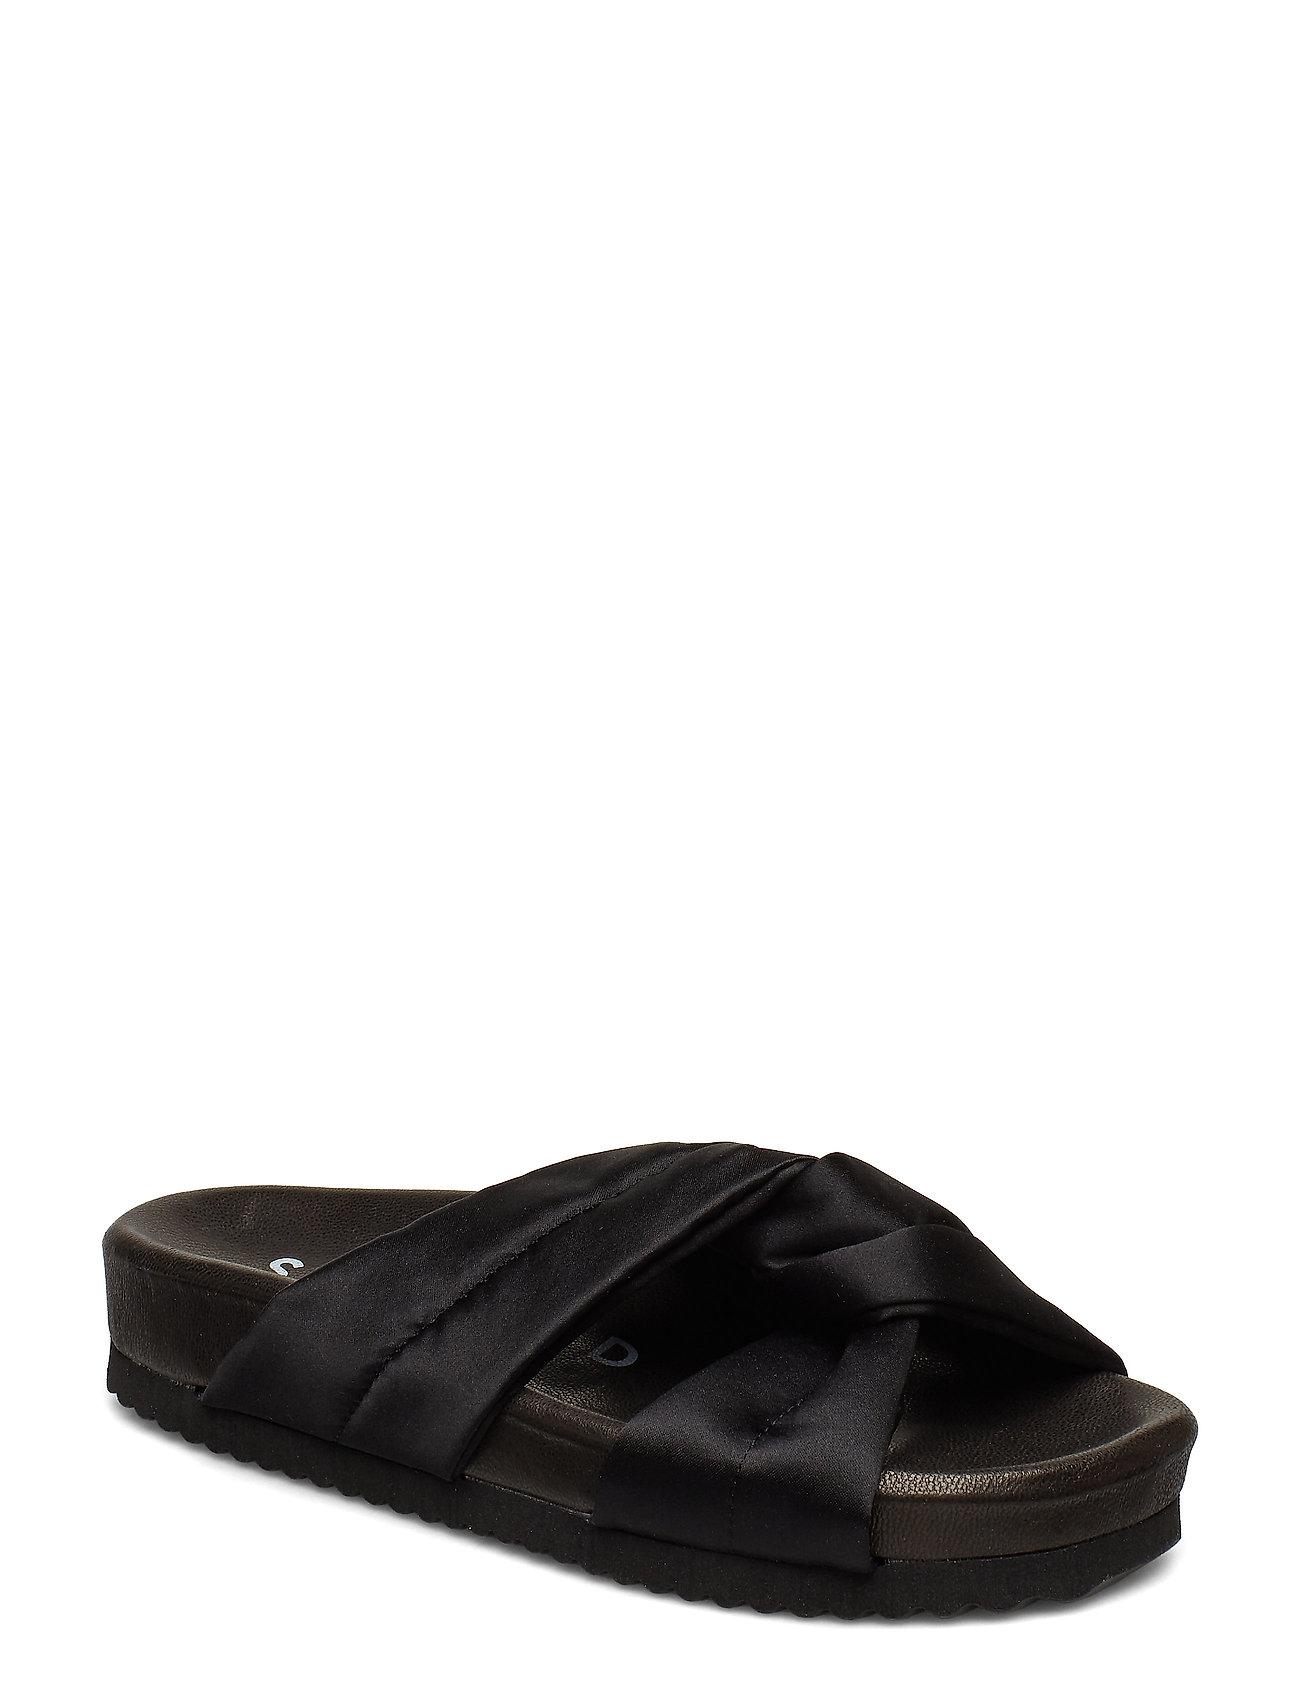 97f764b0ac4 Selected Femme Slfannie Slider B (Black), (51.99 €) | Large ...